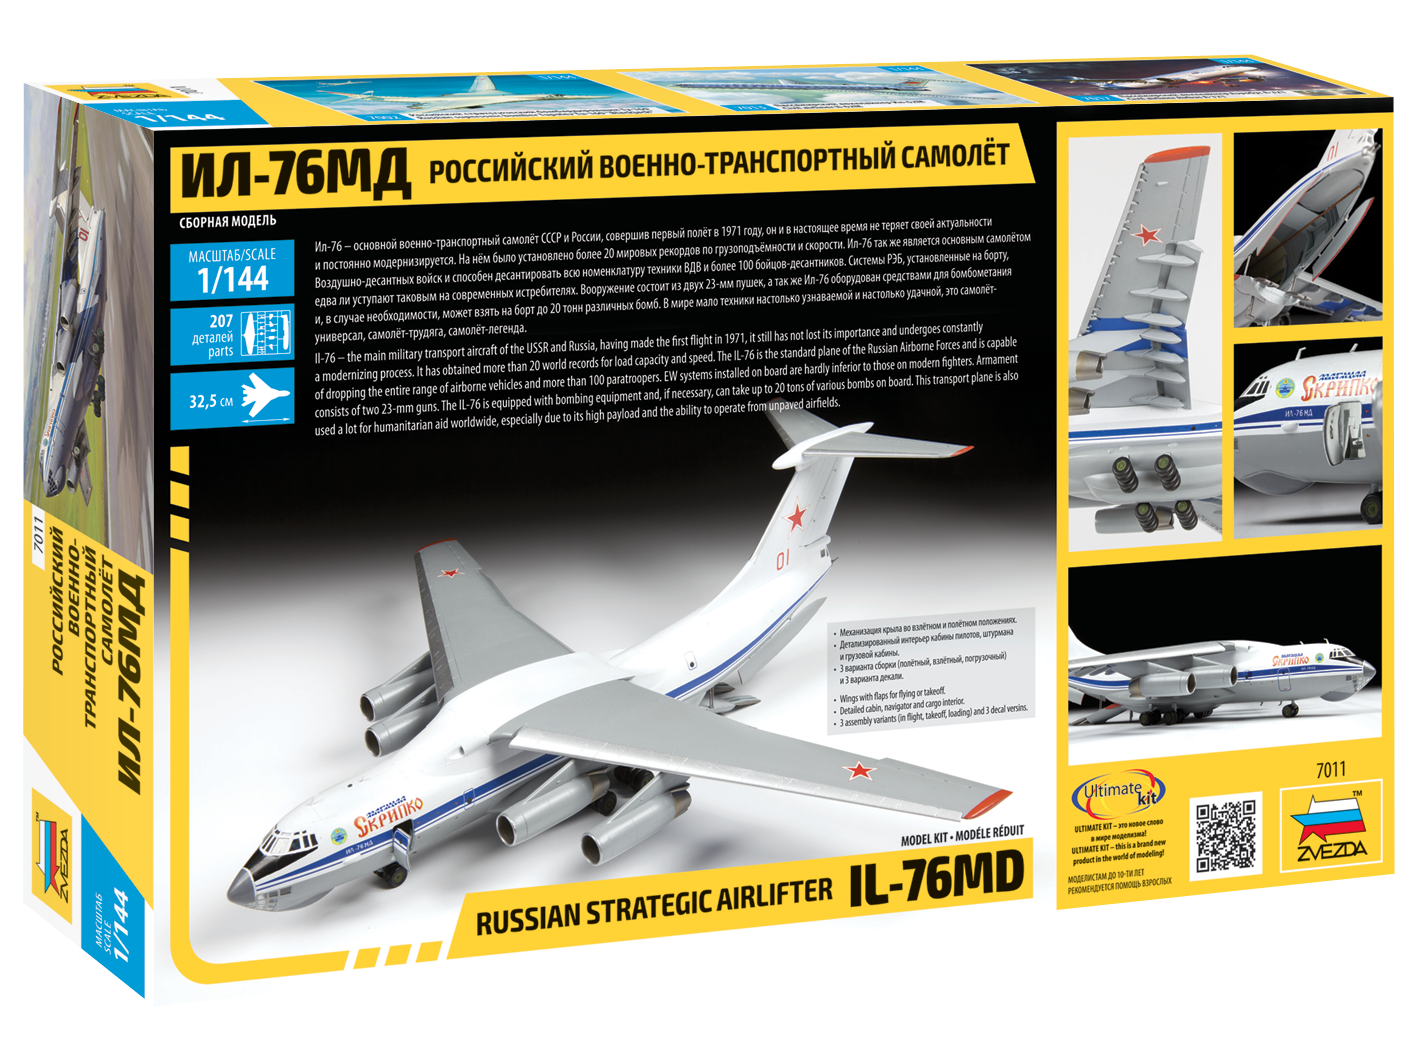 Zvezda 1/144 Russian strategic airlifter Il-76MD # 7011